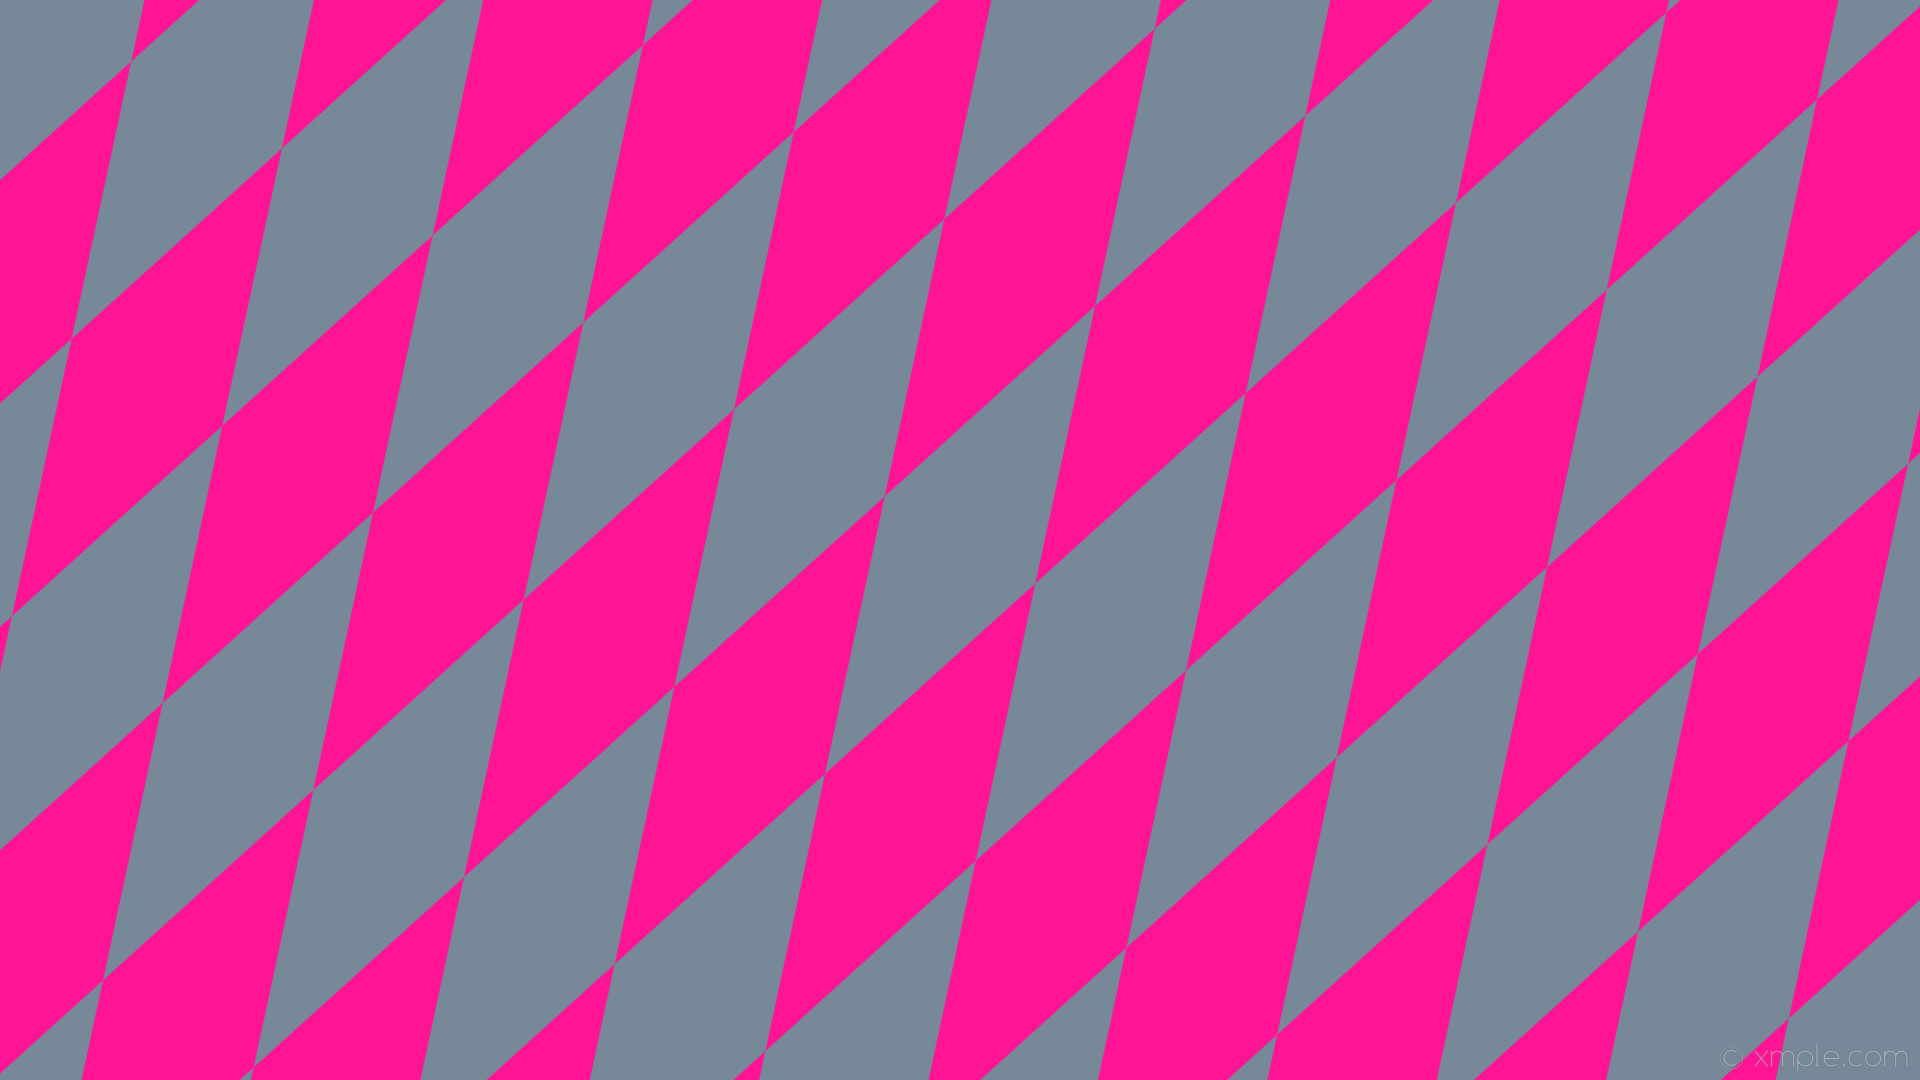 wallpaper pink lozenge diamond grey rhombus light slate gray deep pink  #778899 #ff1493 60